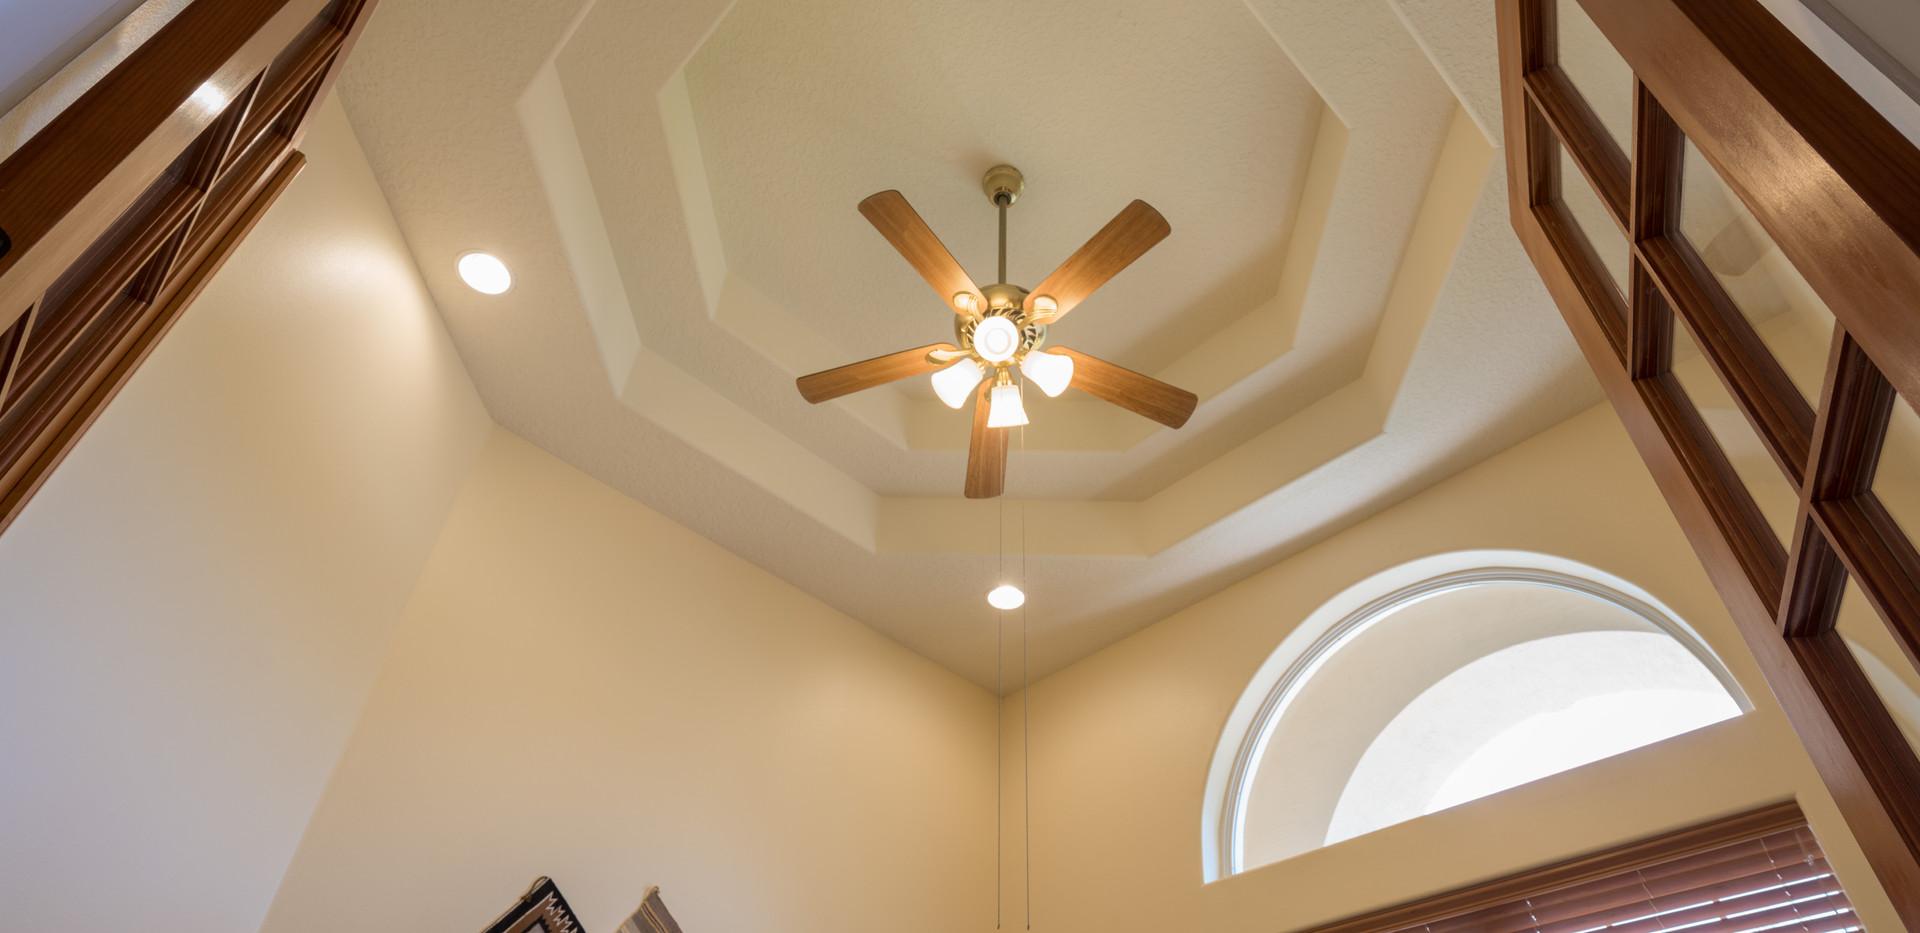 Dramatic Den Ceiling